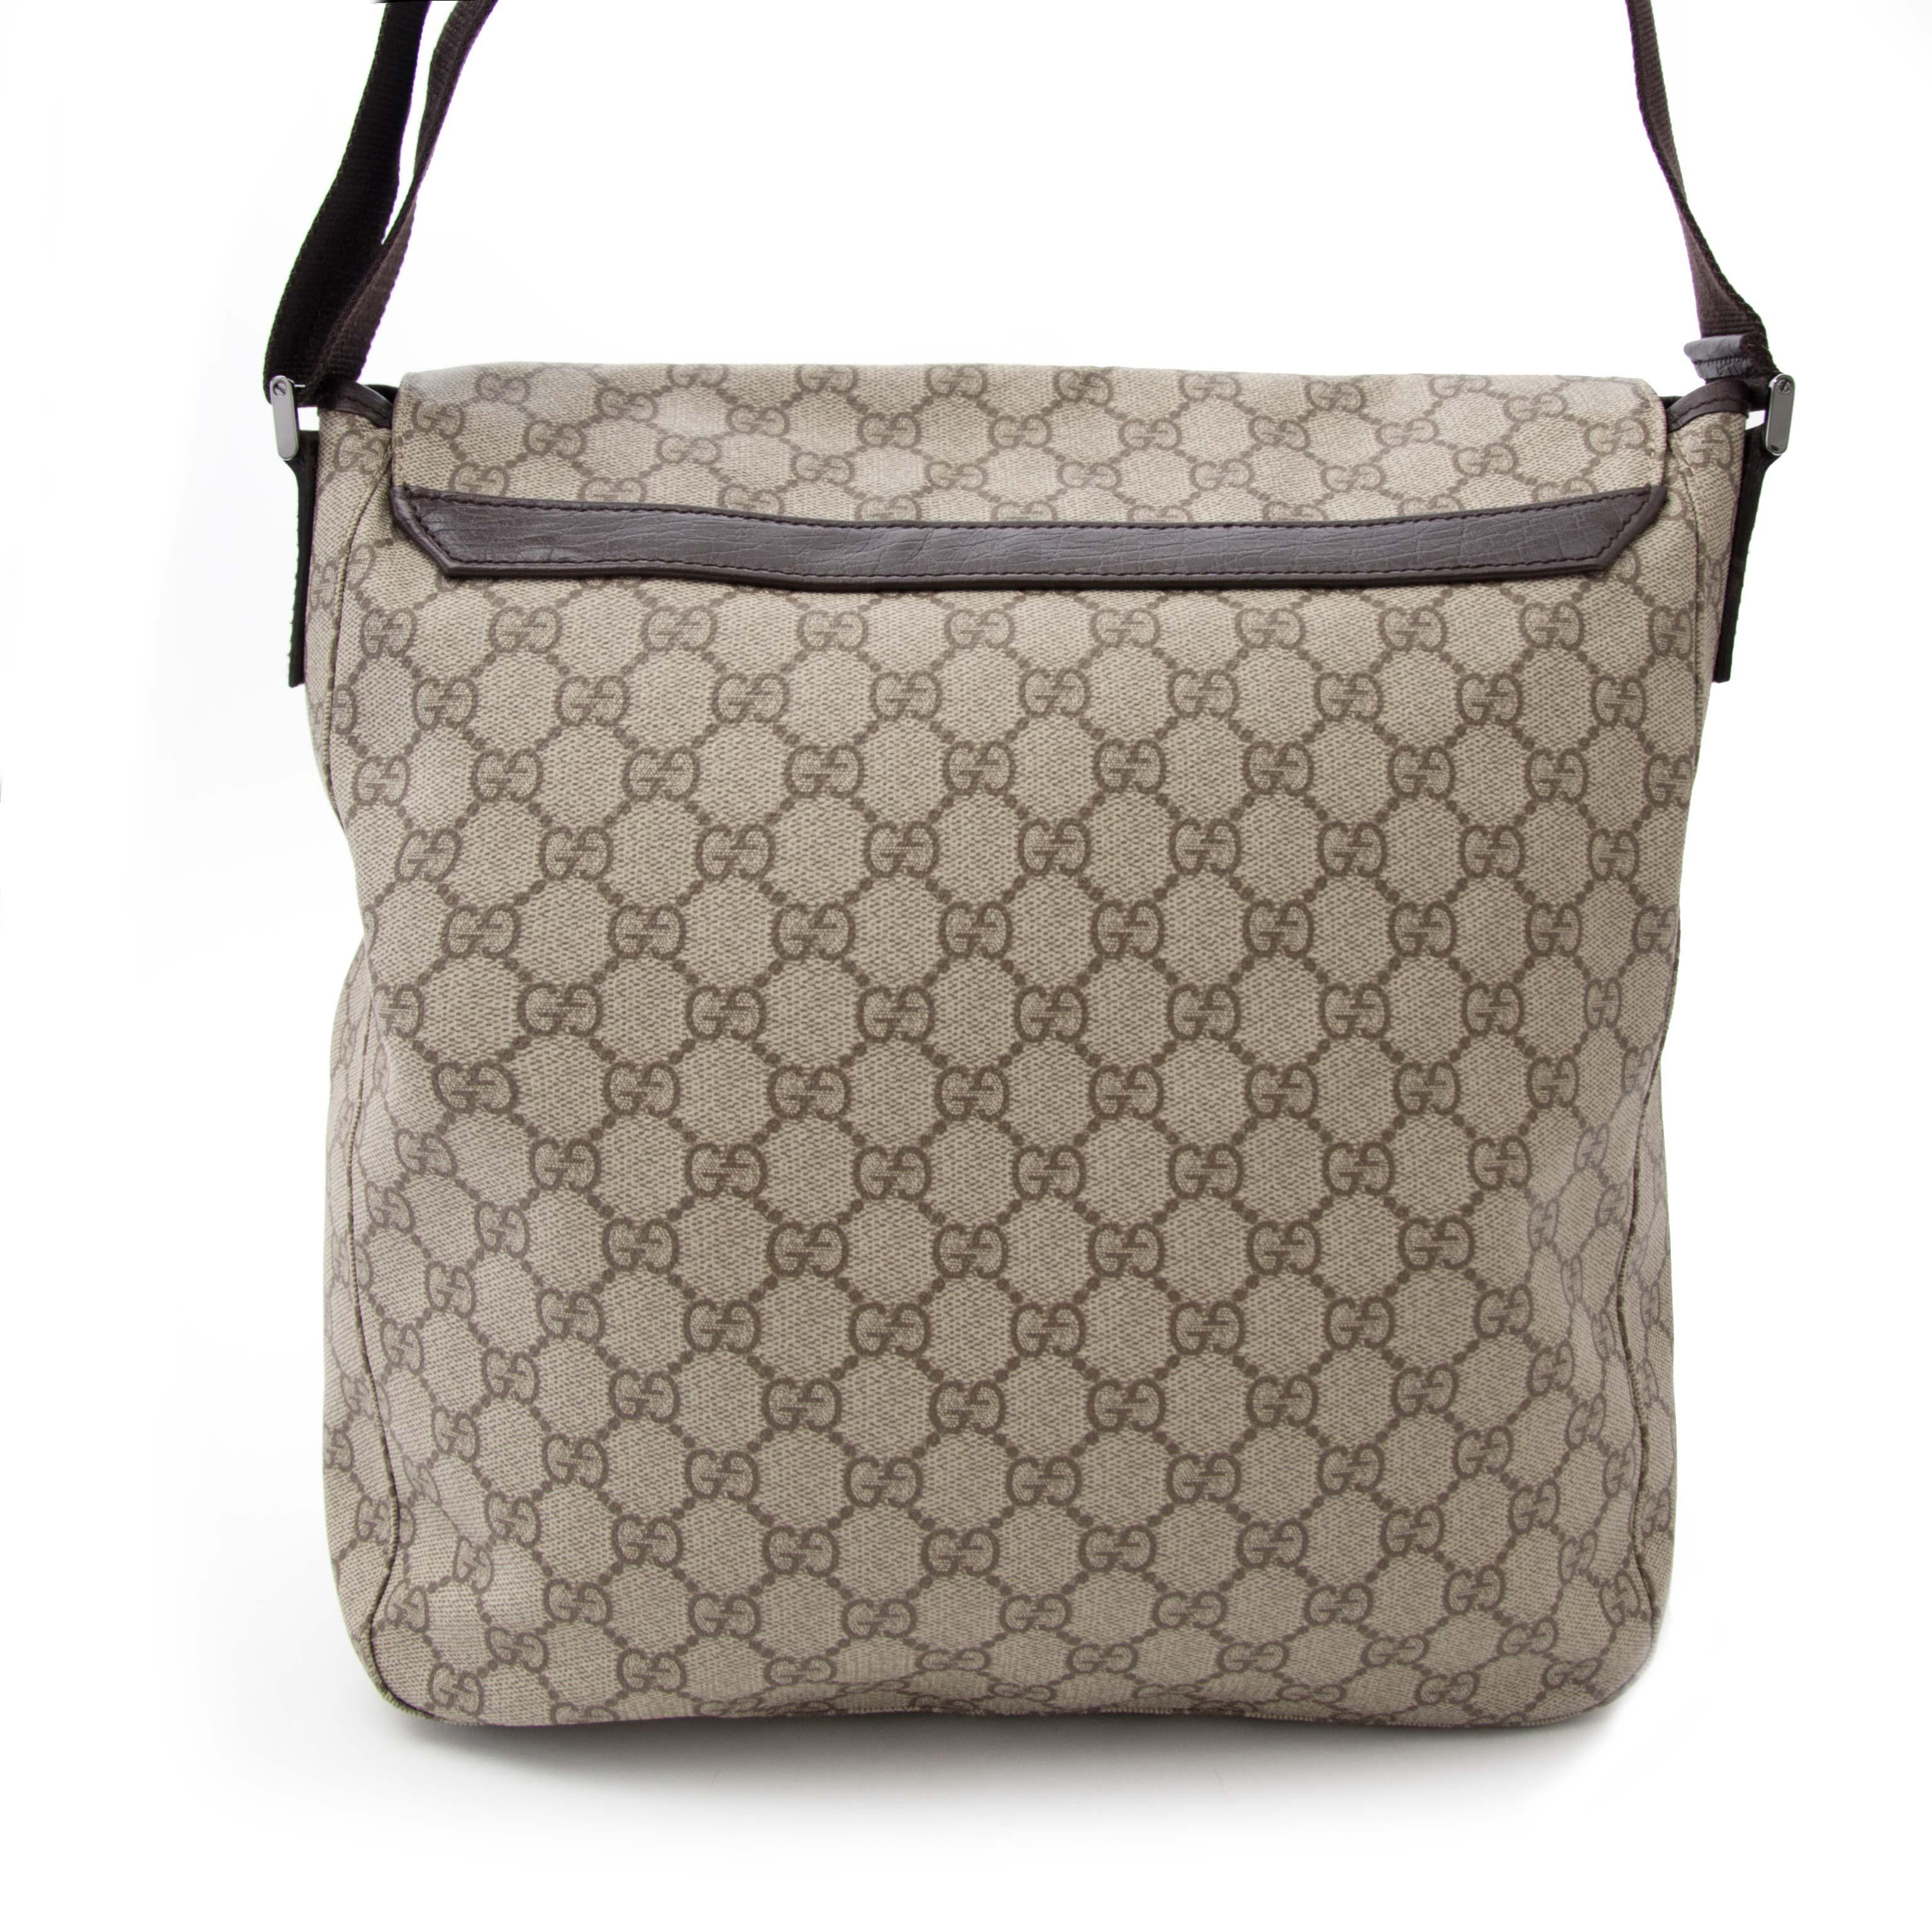 comme neuf sac a main Gucci Monogram Messenger Bag